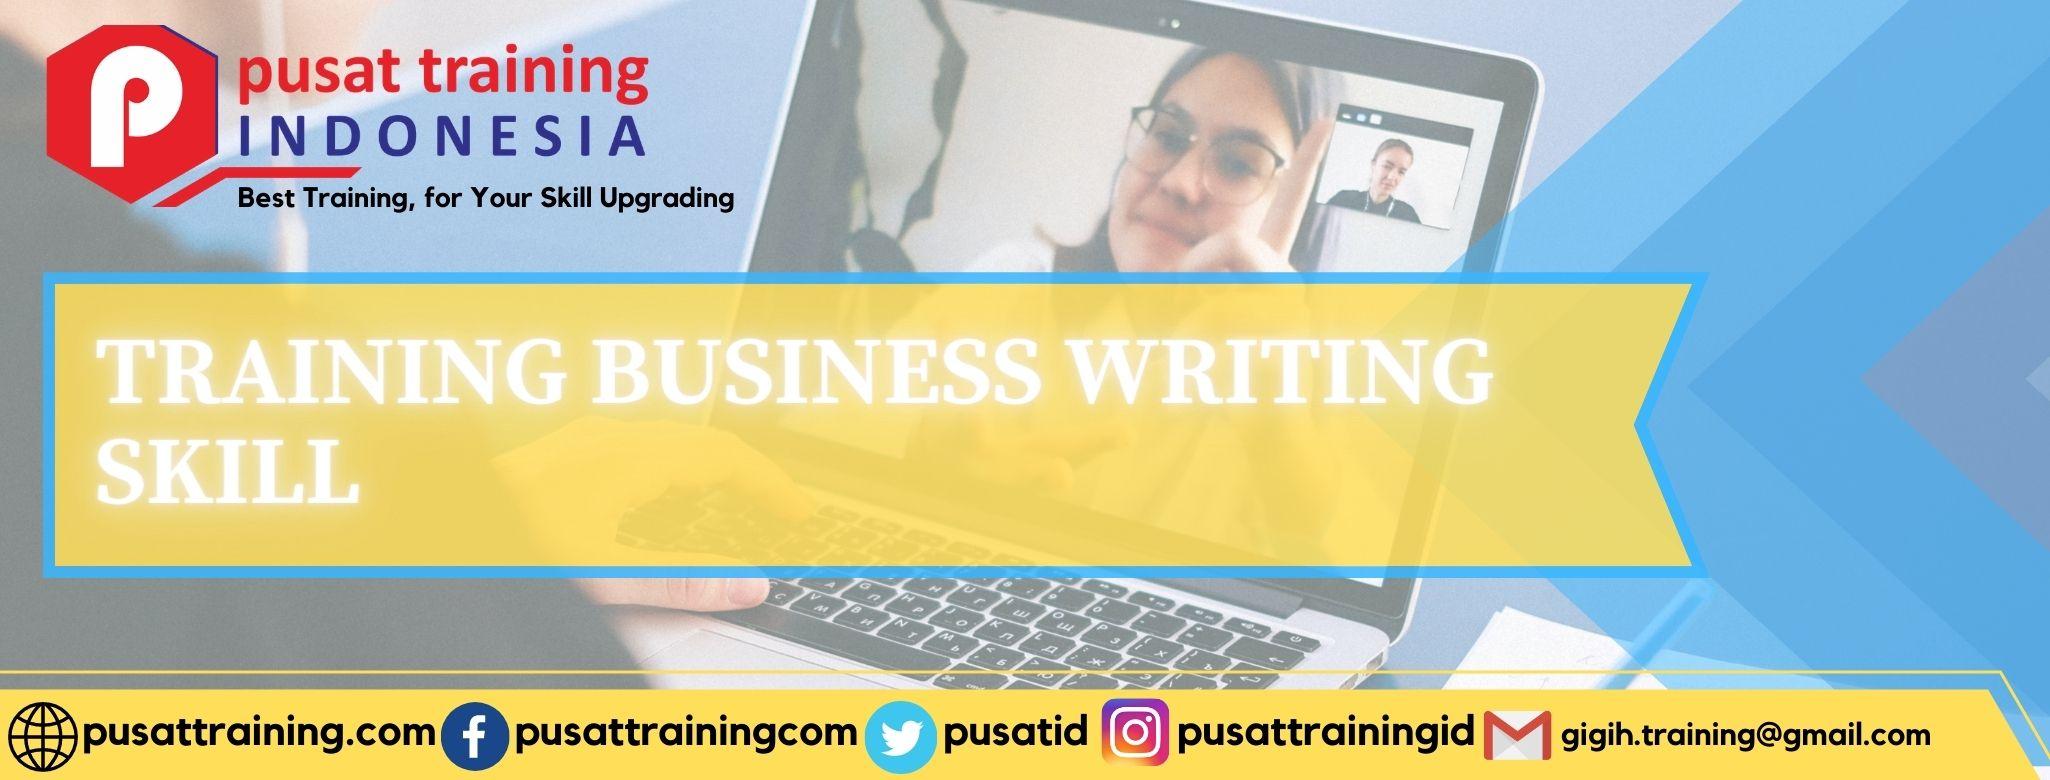 TRAINING BUSINESS WRITING SKILL